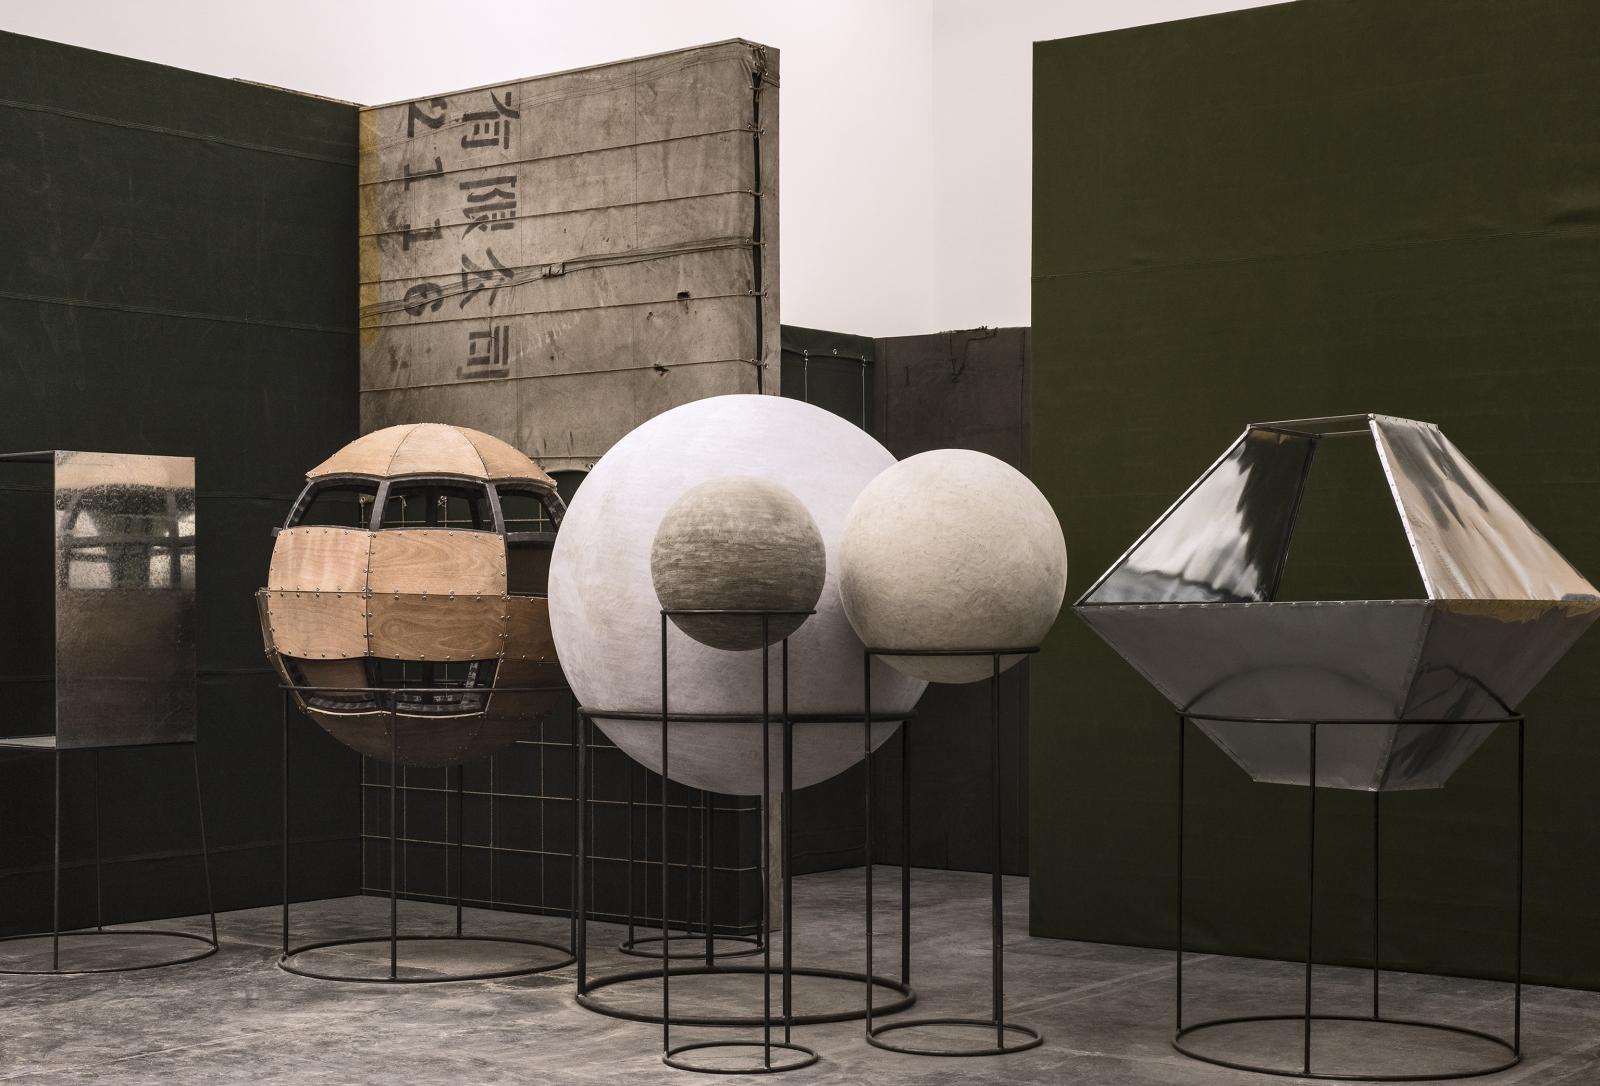 Liu Wei, Colors, Installation view